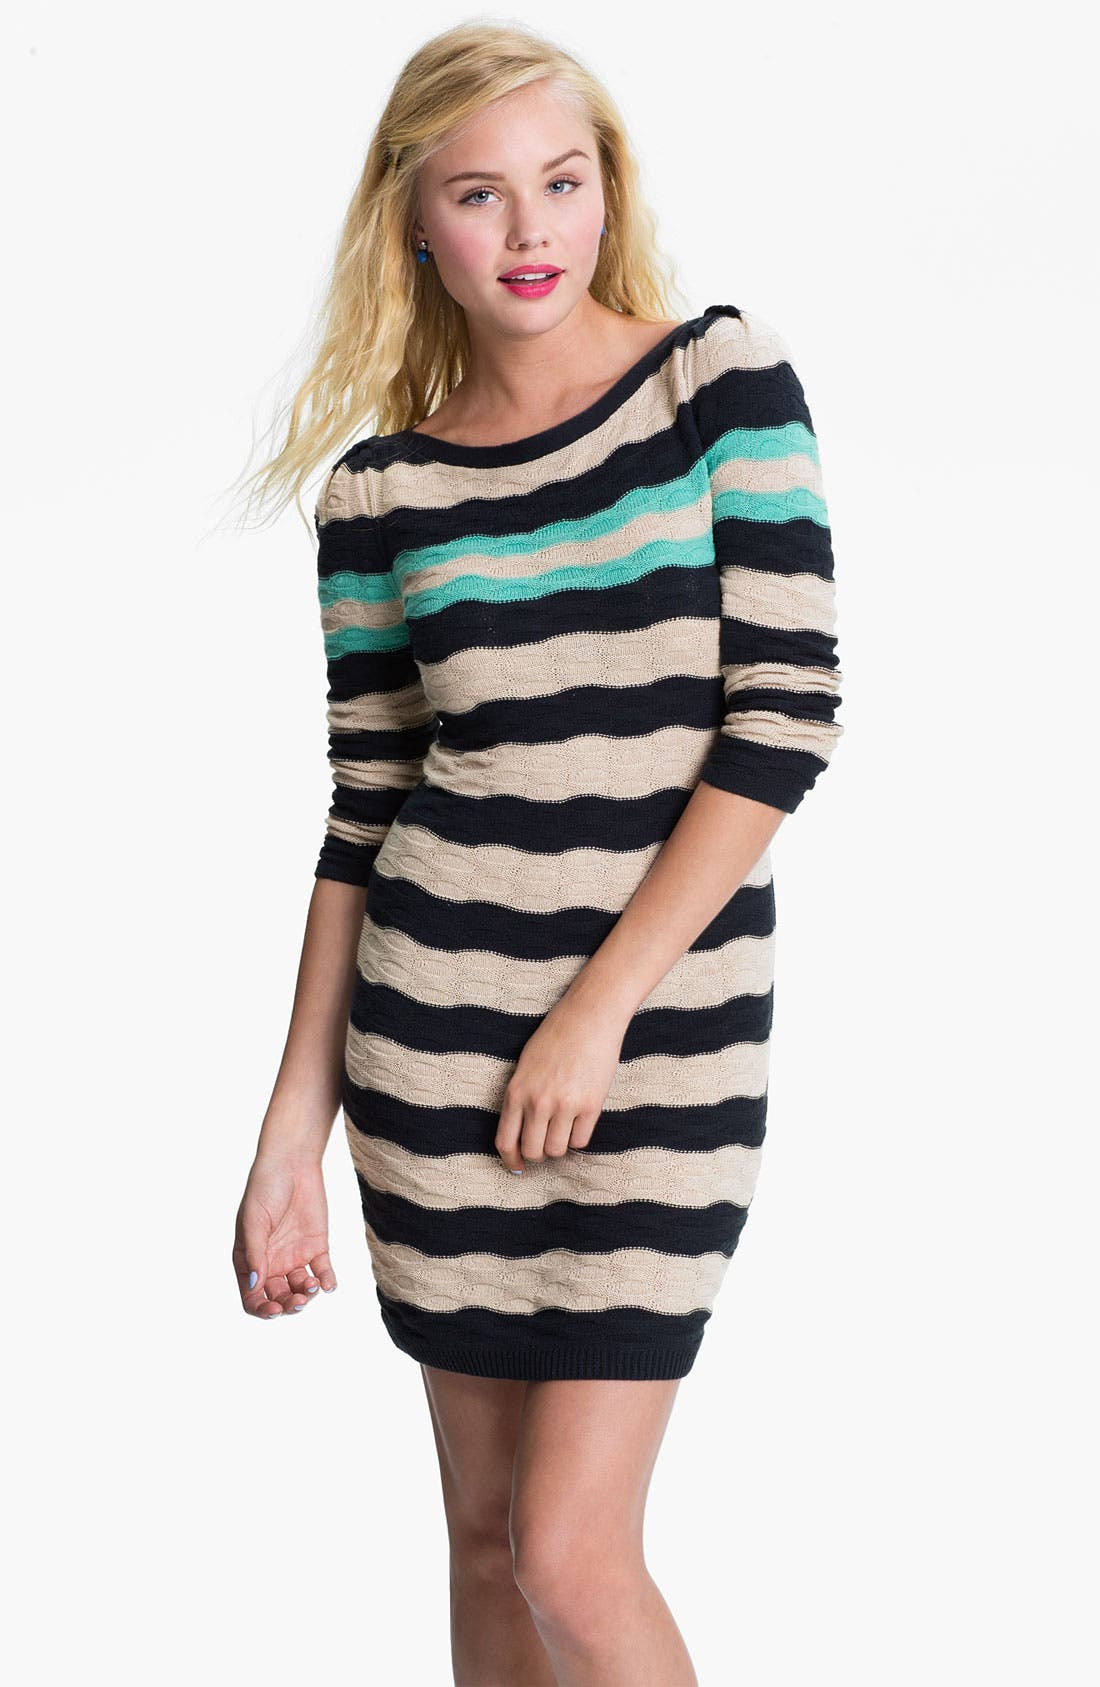 Alternate Image 1 Selected - BP. Texture Knit Sweater Dress (Juniors)